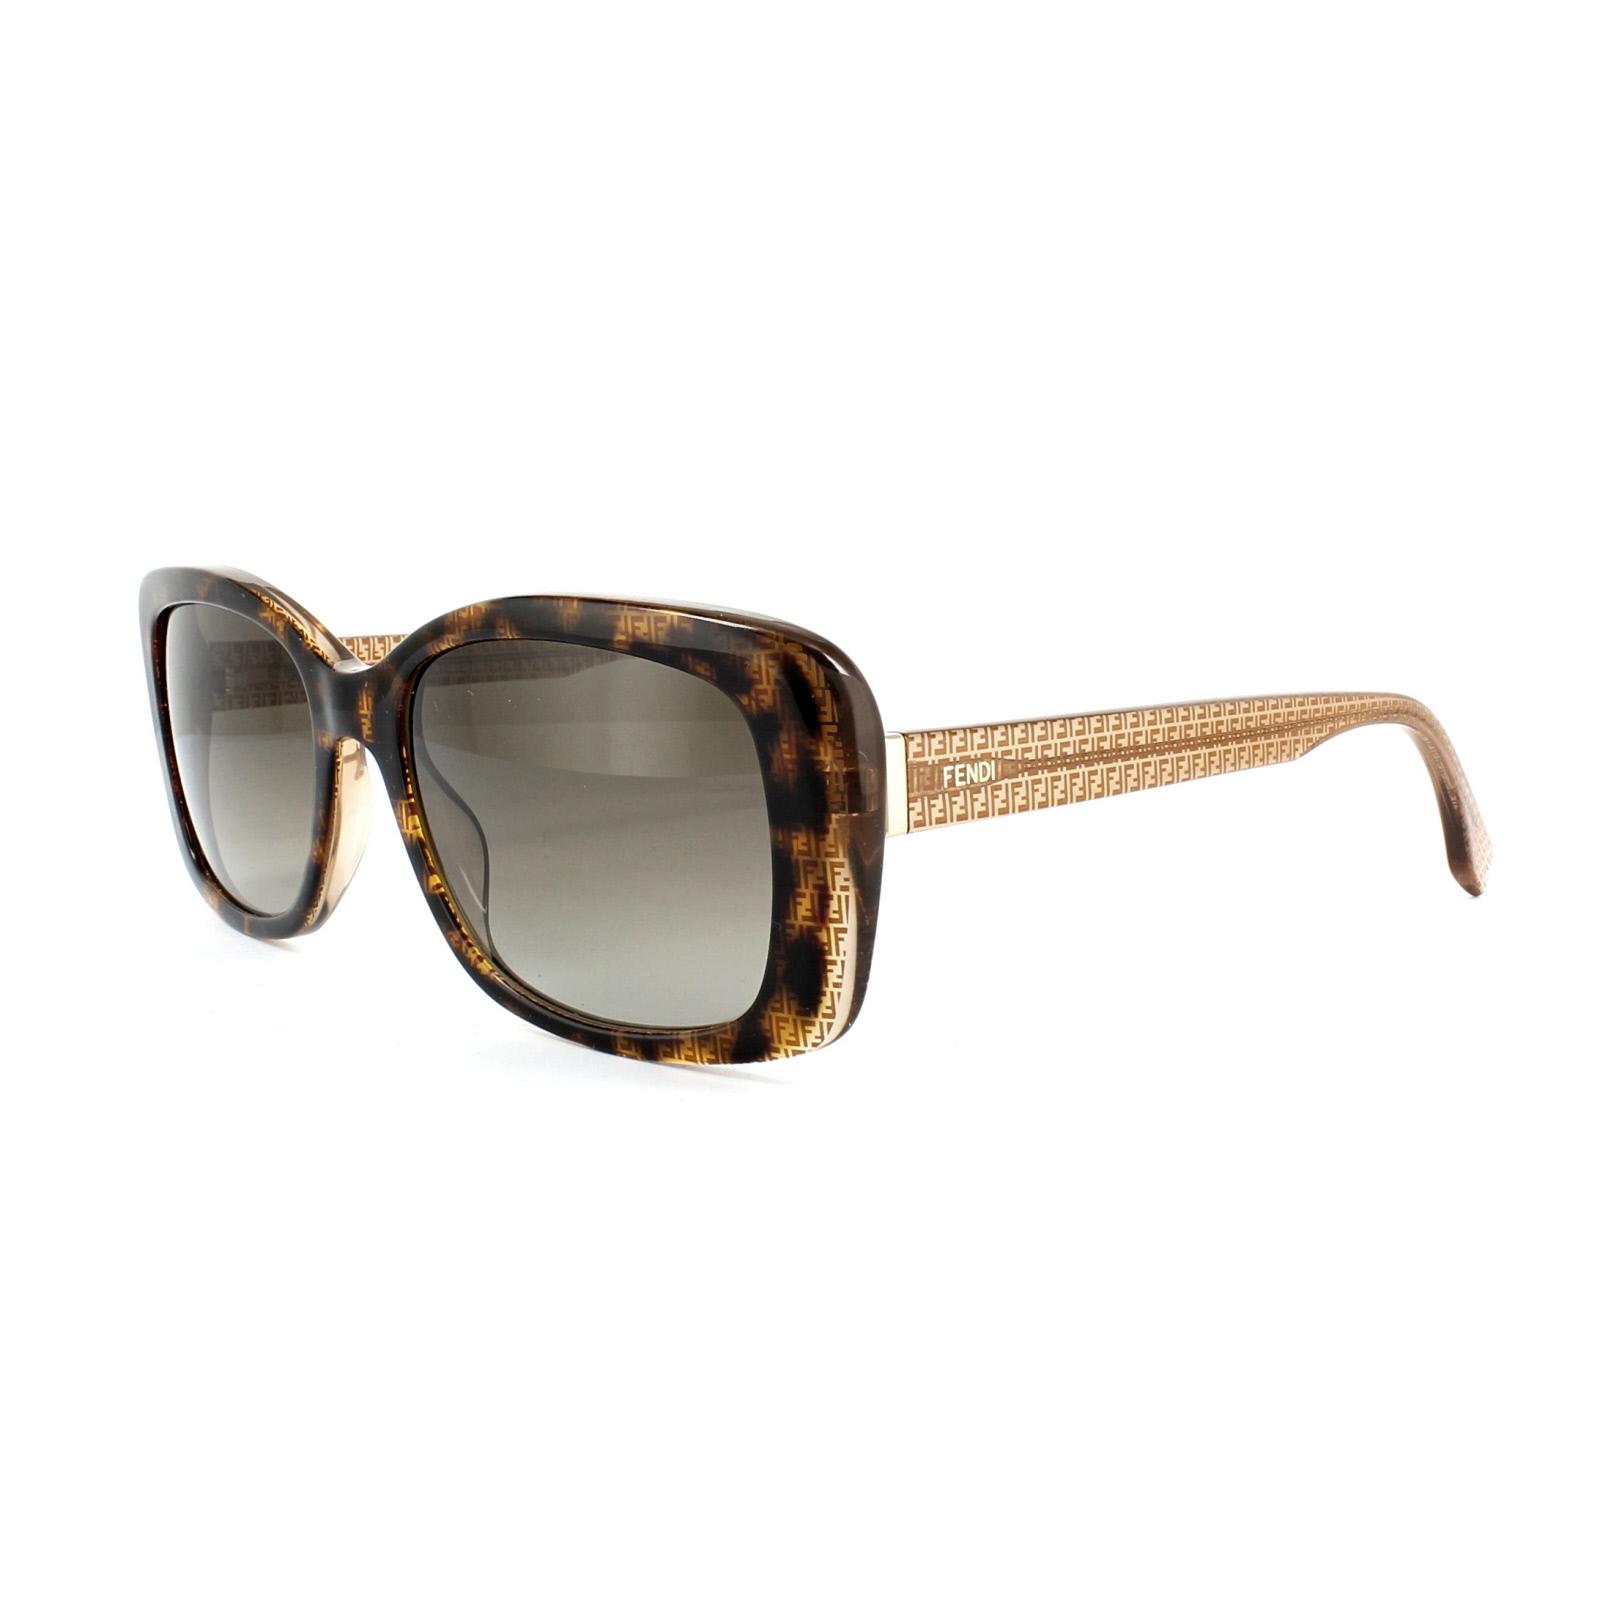 df4cb0676fd Sentinel Fendi Sunglasses Micrologo FF 0002 S 7PL HA Havana Beige Brown  Brown Gradient